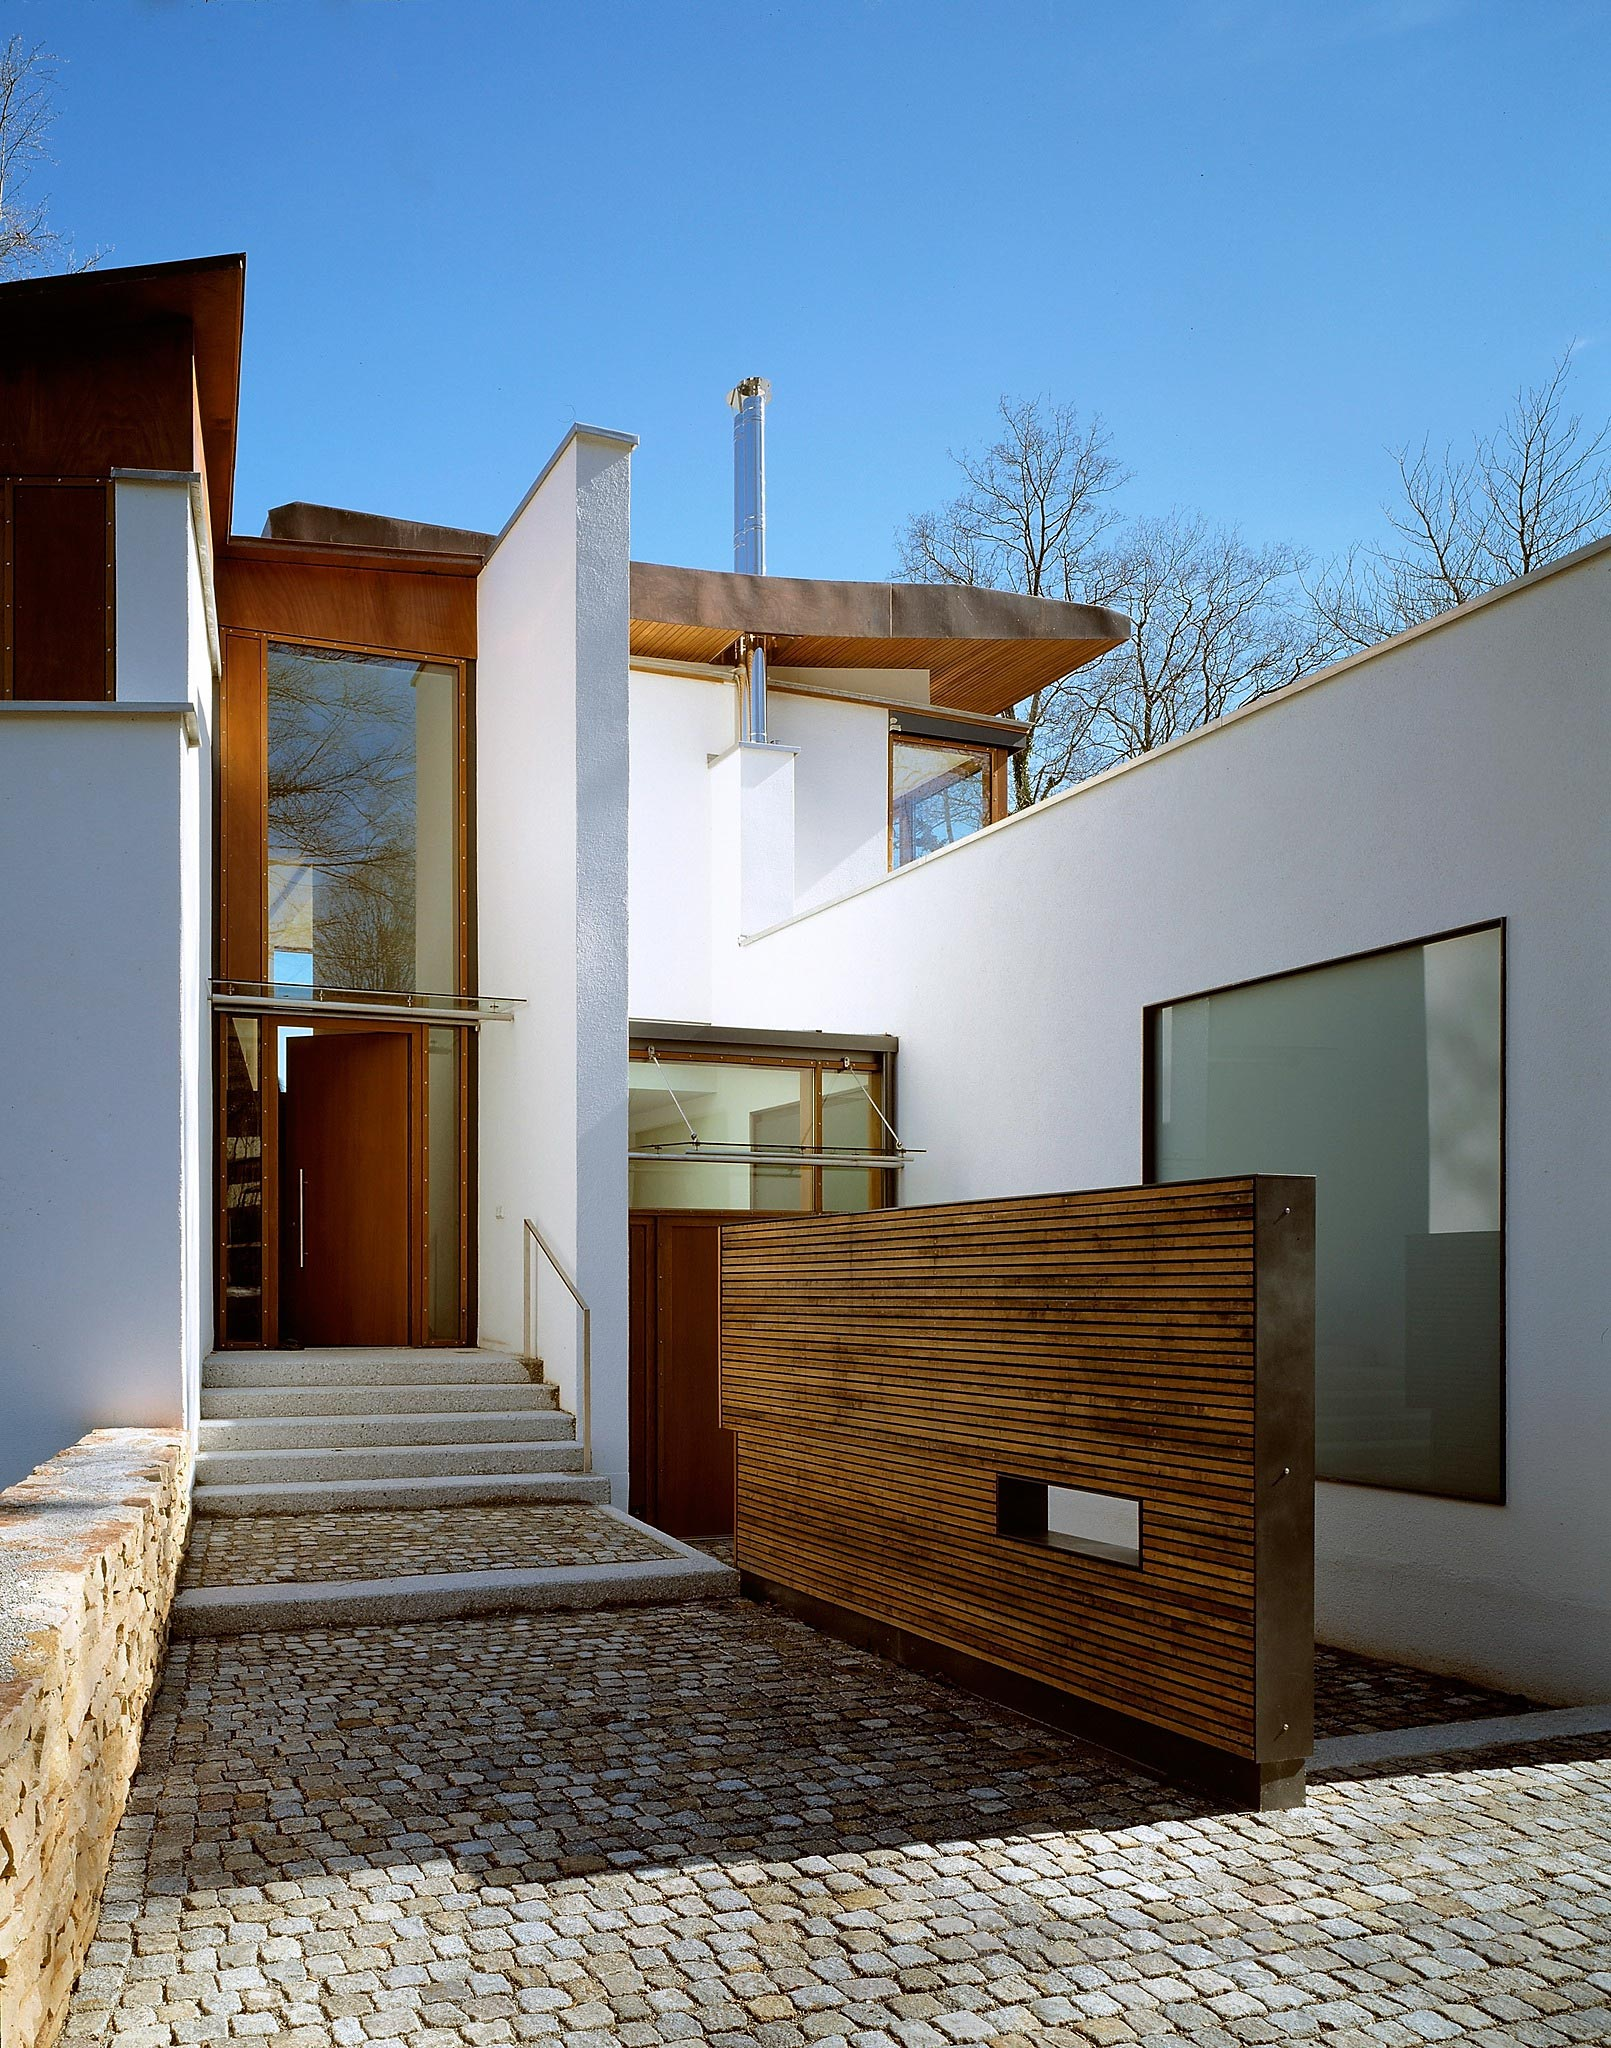 architekten starnberg raumstation architekten starnberg. Black Bedroom Furniture Sets. Home Design Ideas